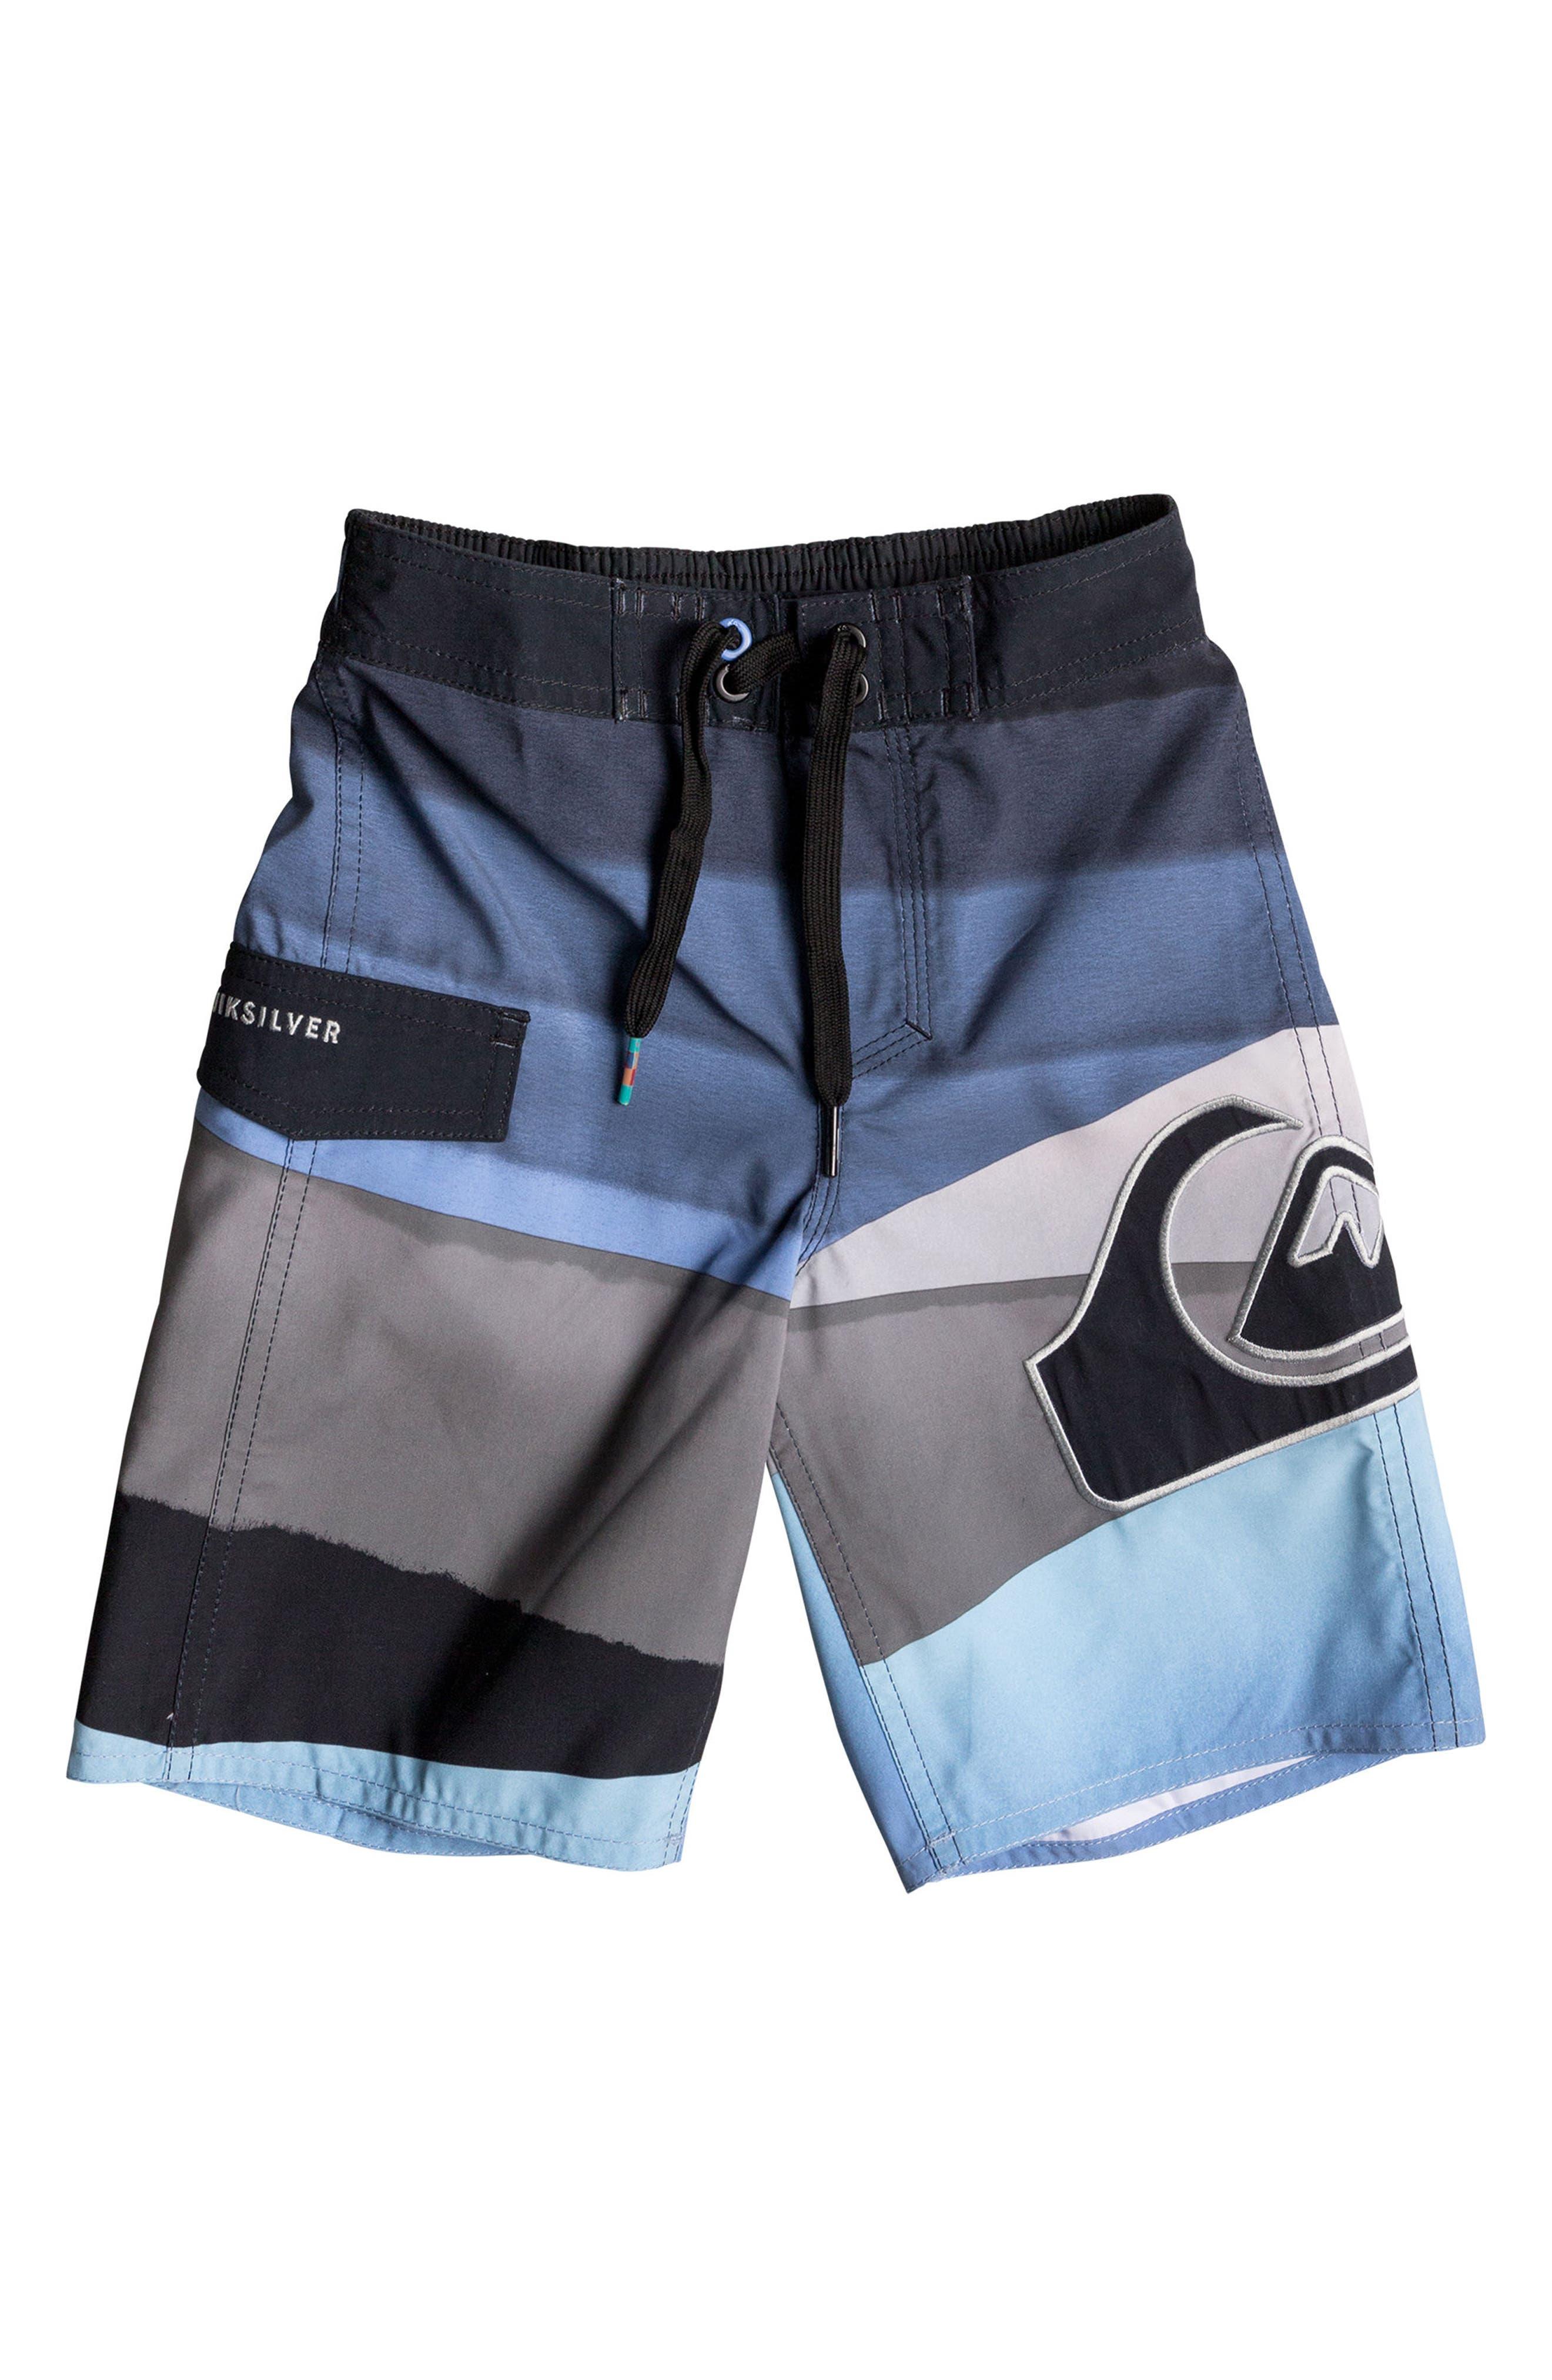 Slash Board Shorts,                         Main,                         color, 440